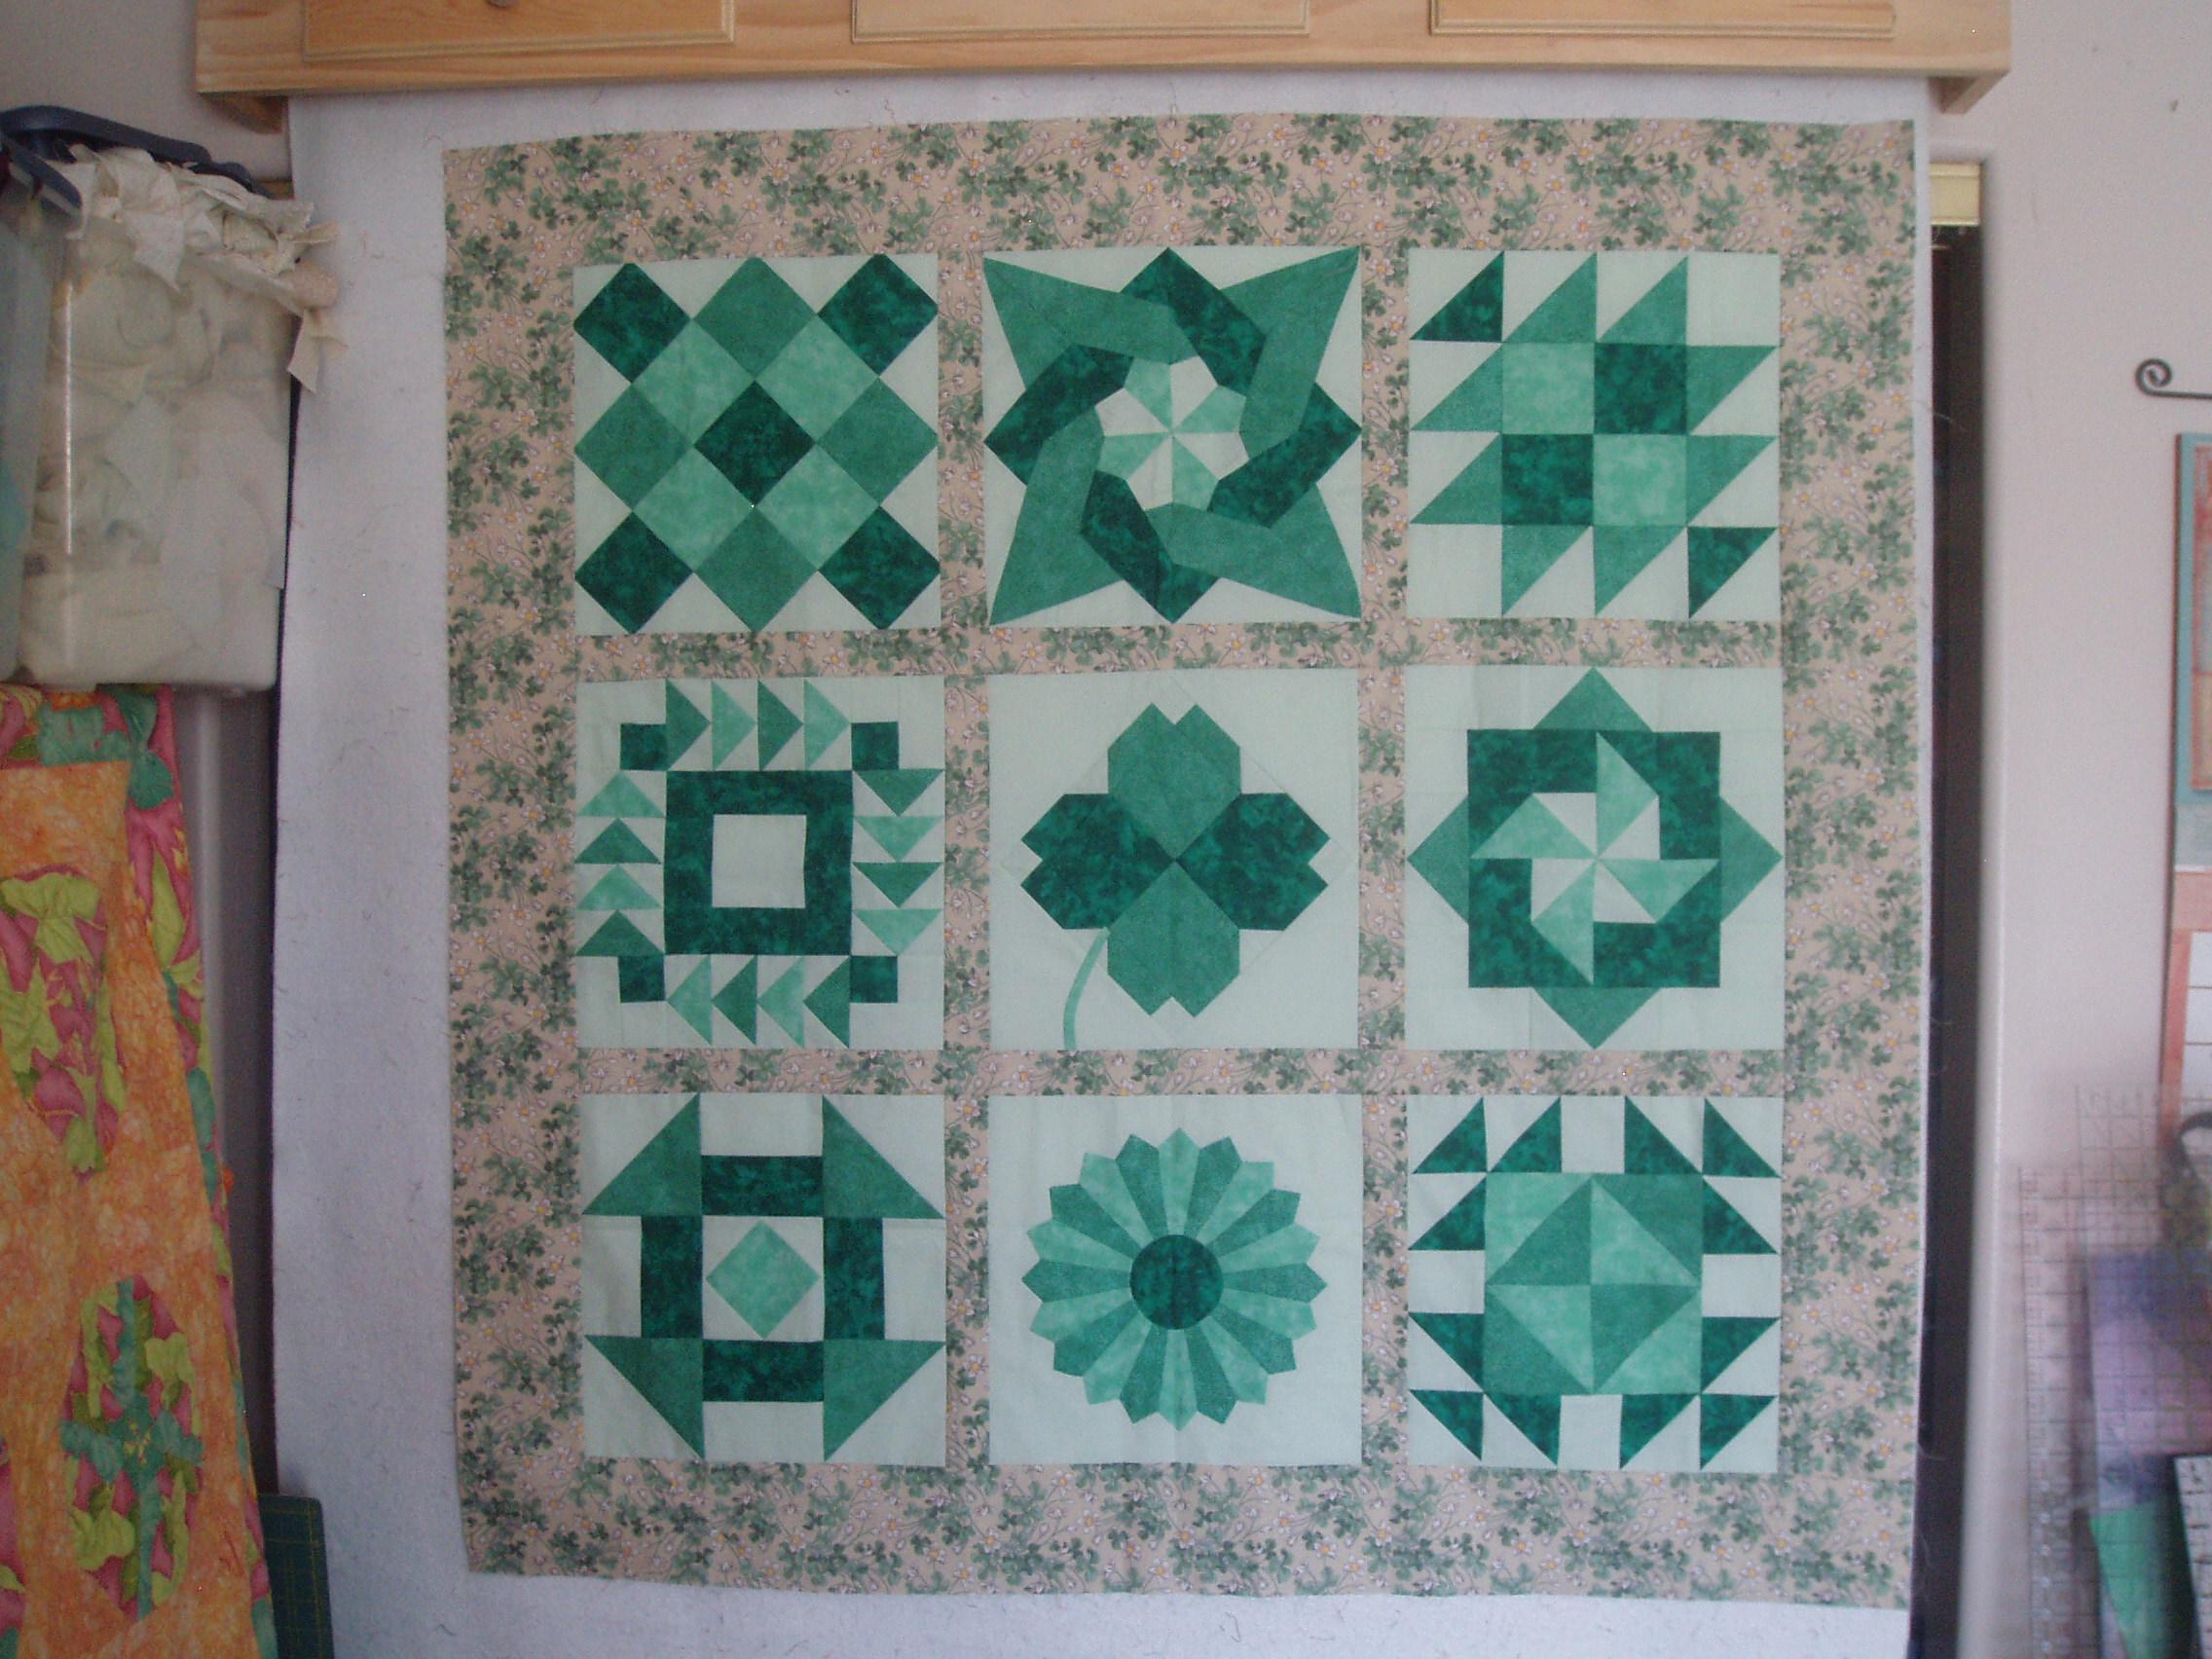 Name:  St. Patricks wall quilt.jpg.JPG Views: 2284 Size:  878.8 KB